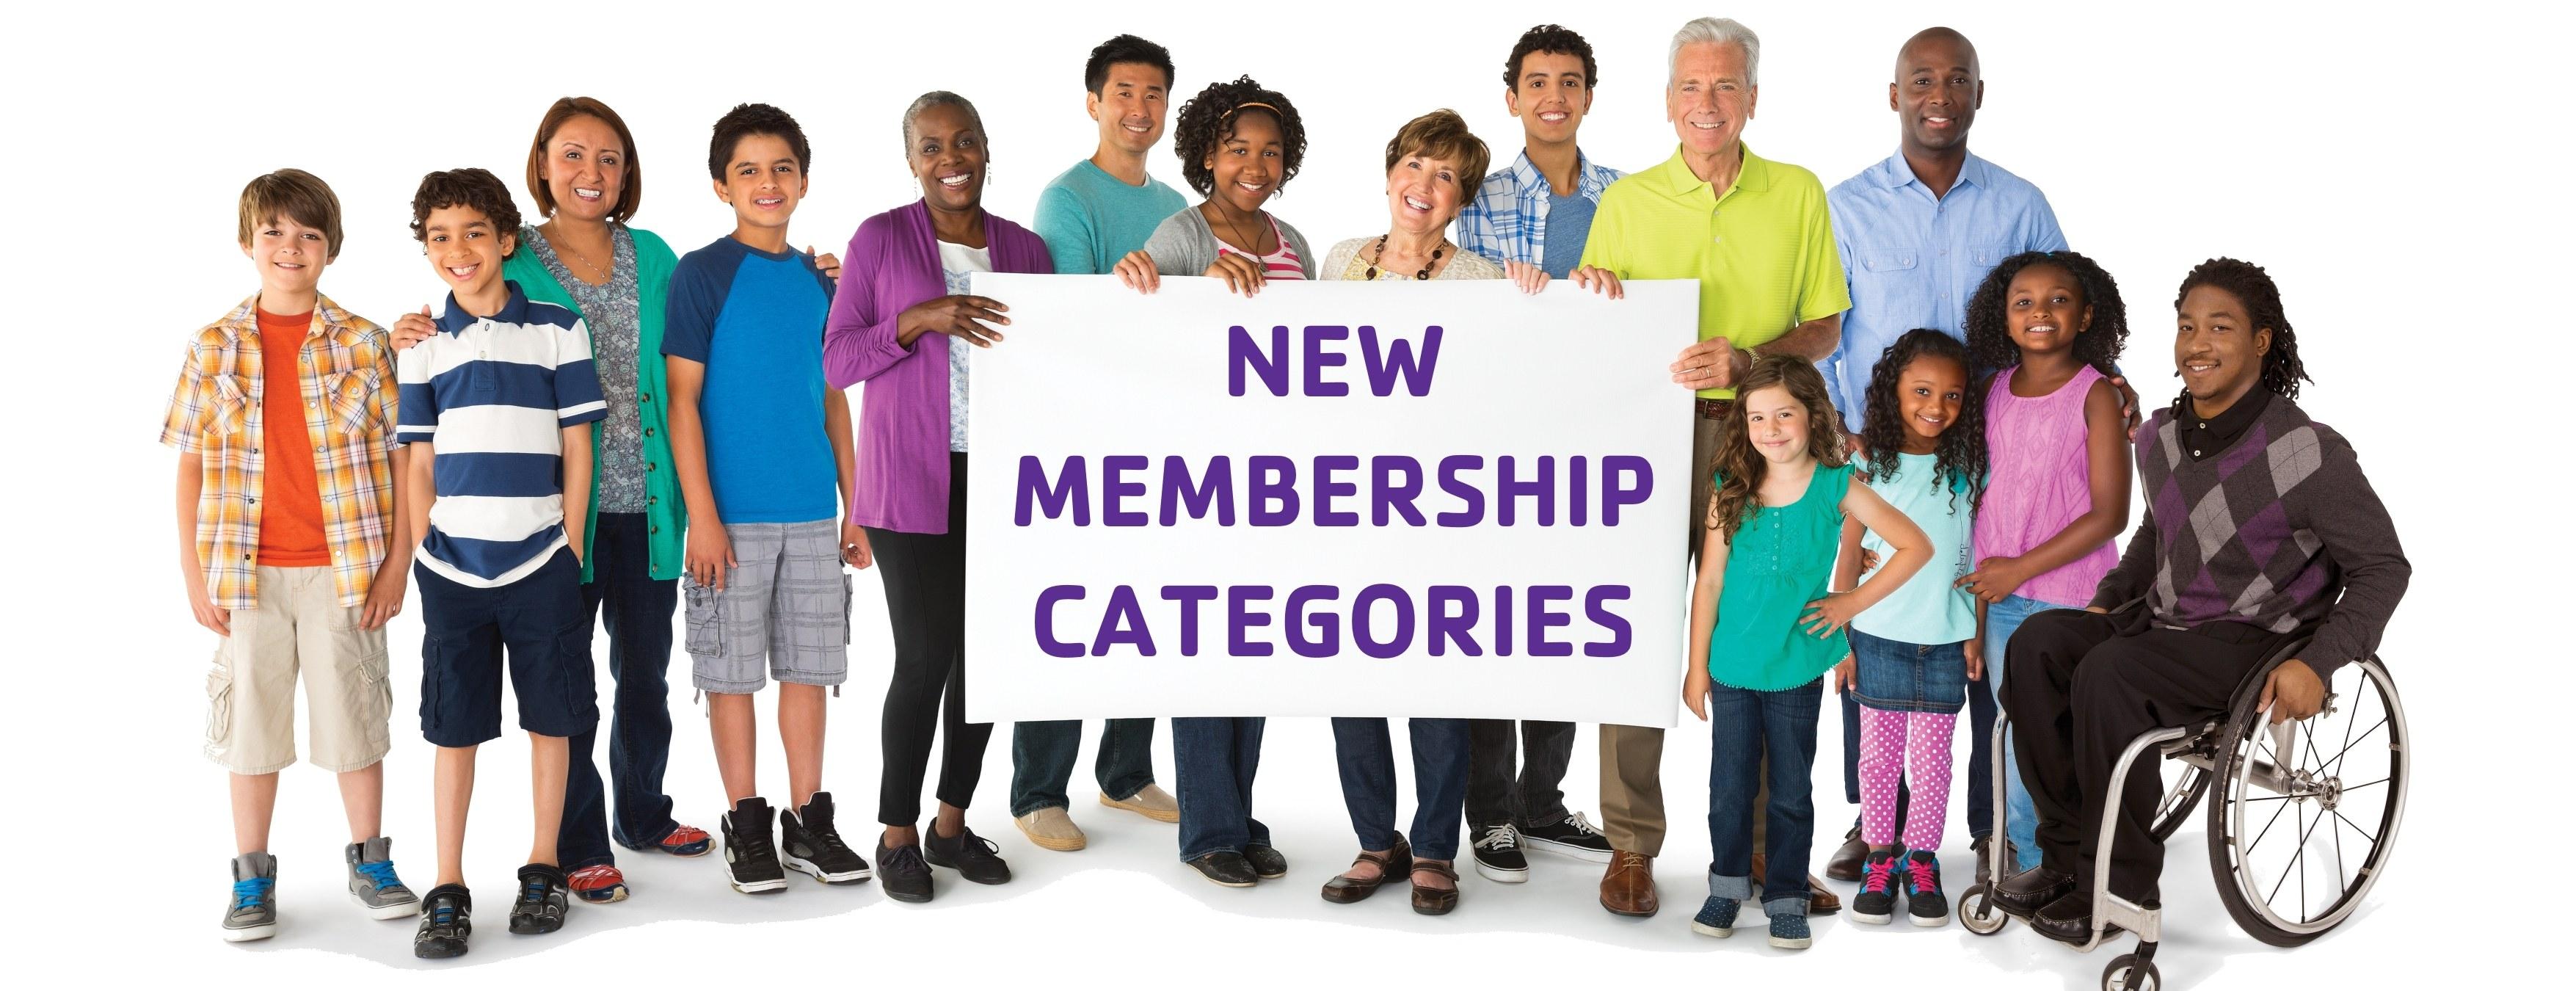 New-Membership-Categories-Slider-11.7x4.5